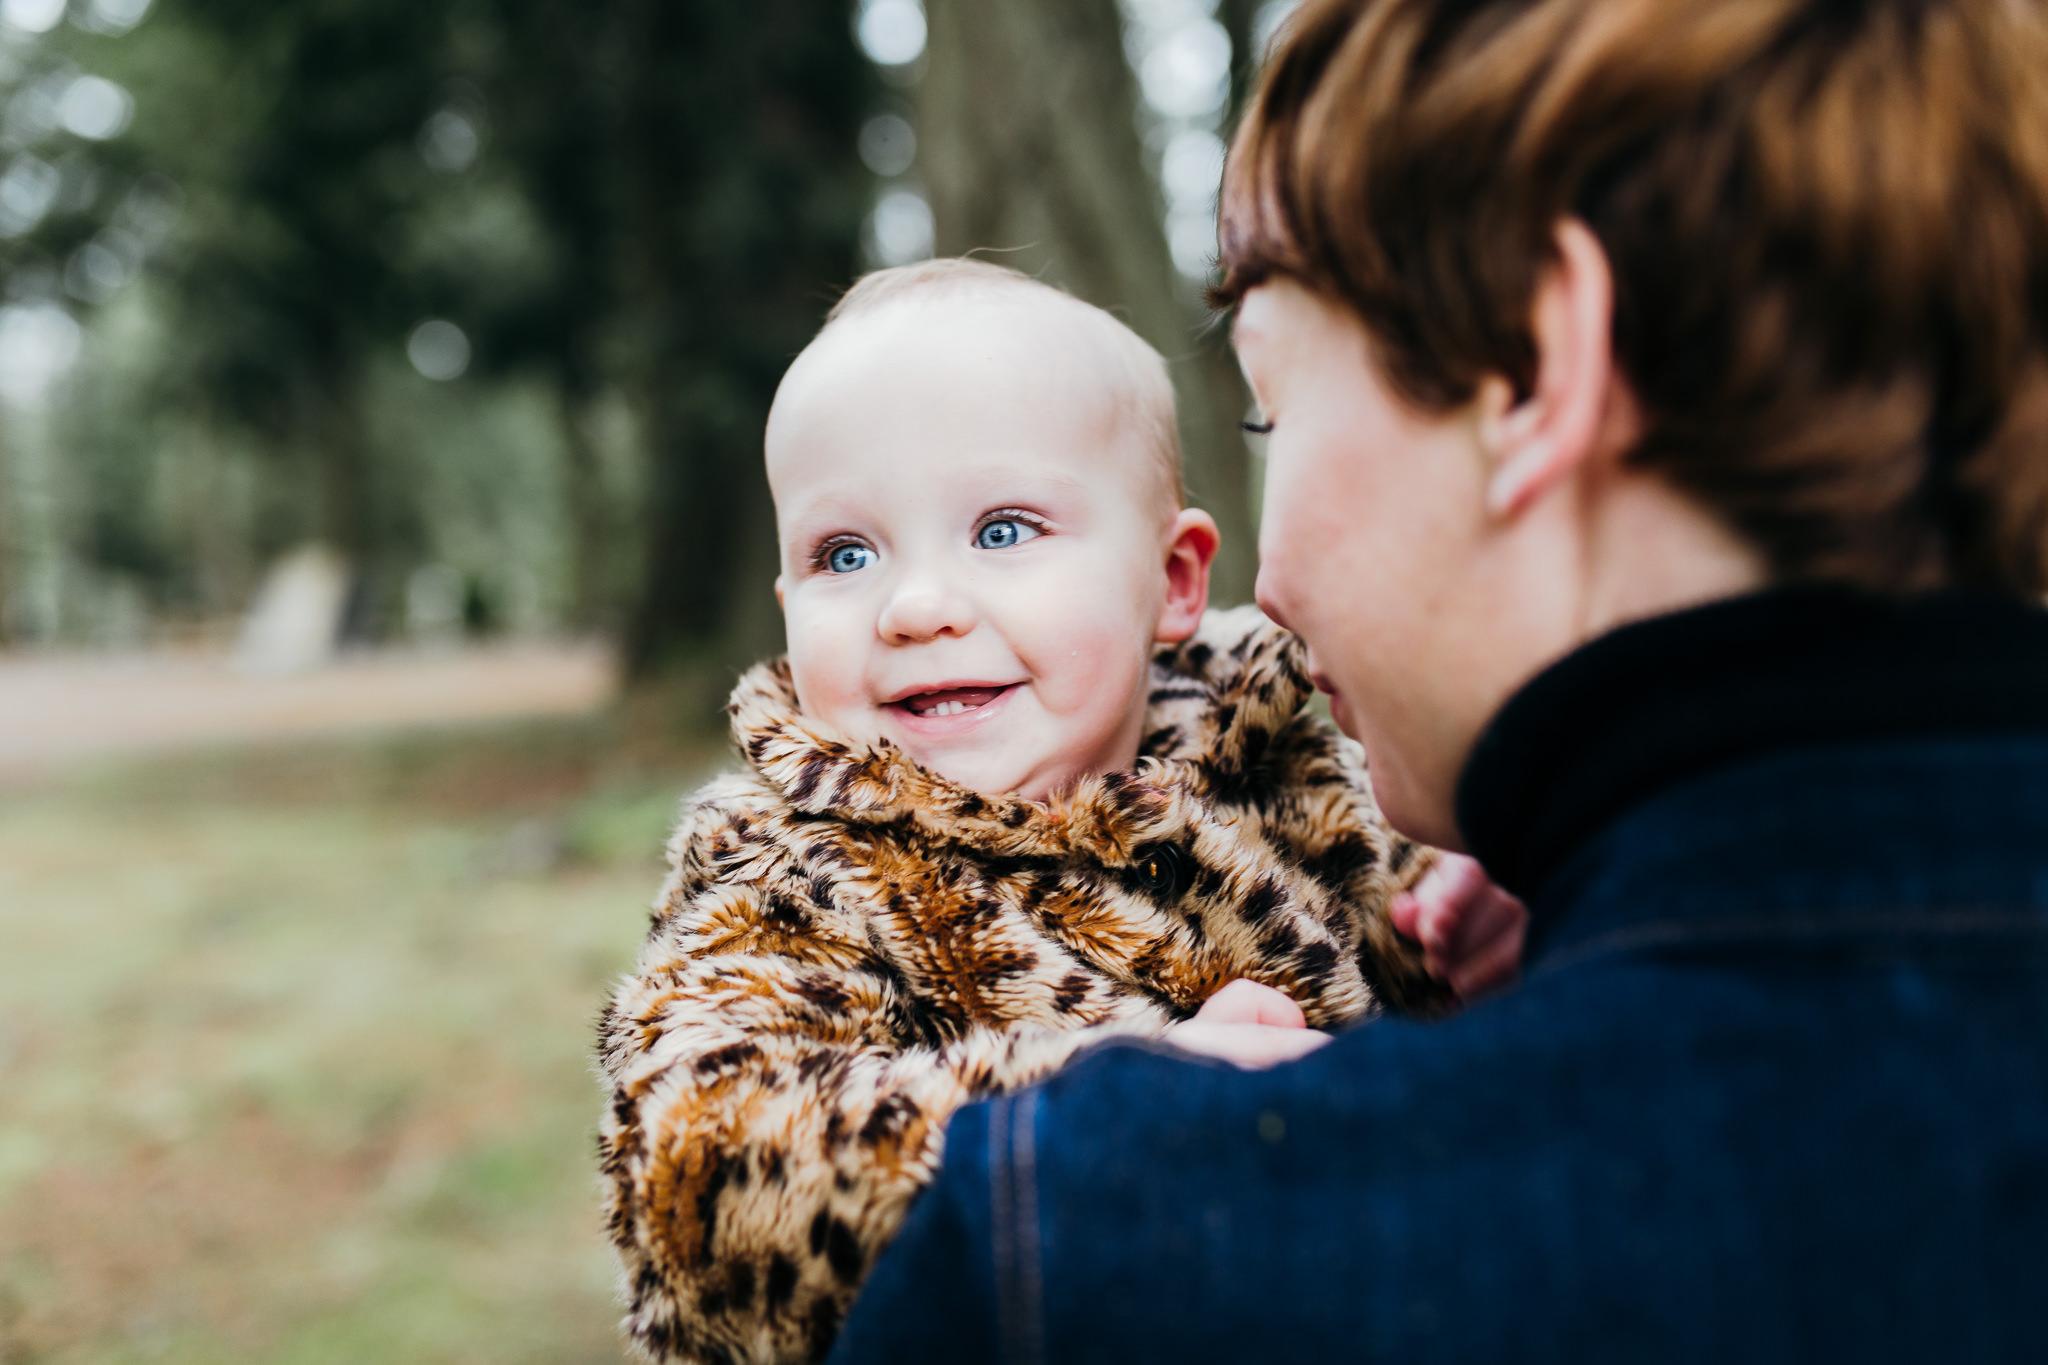 Chilliwack-Abbotsford-Langley-Family-Photographer-10.jpg